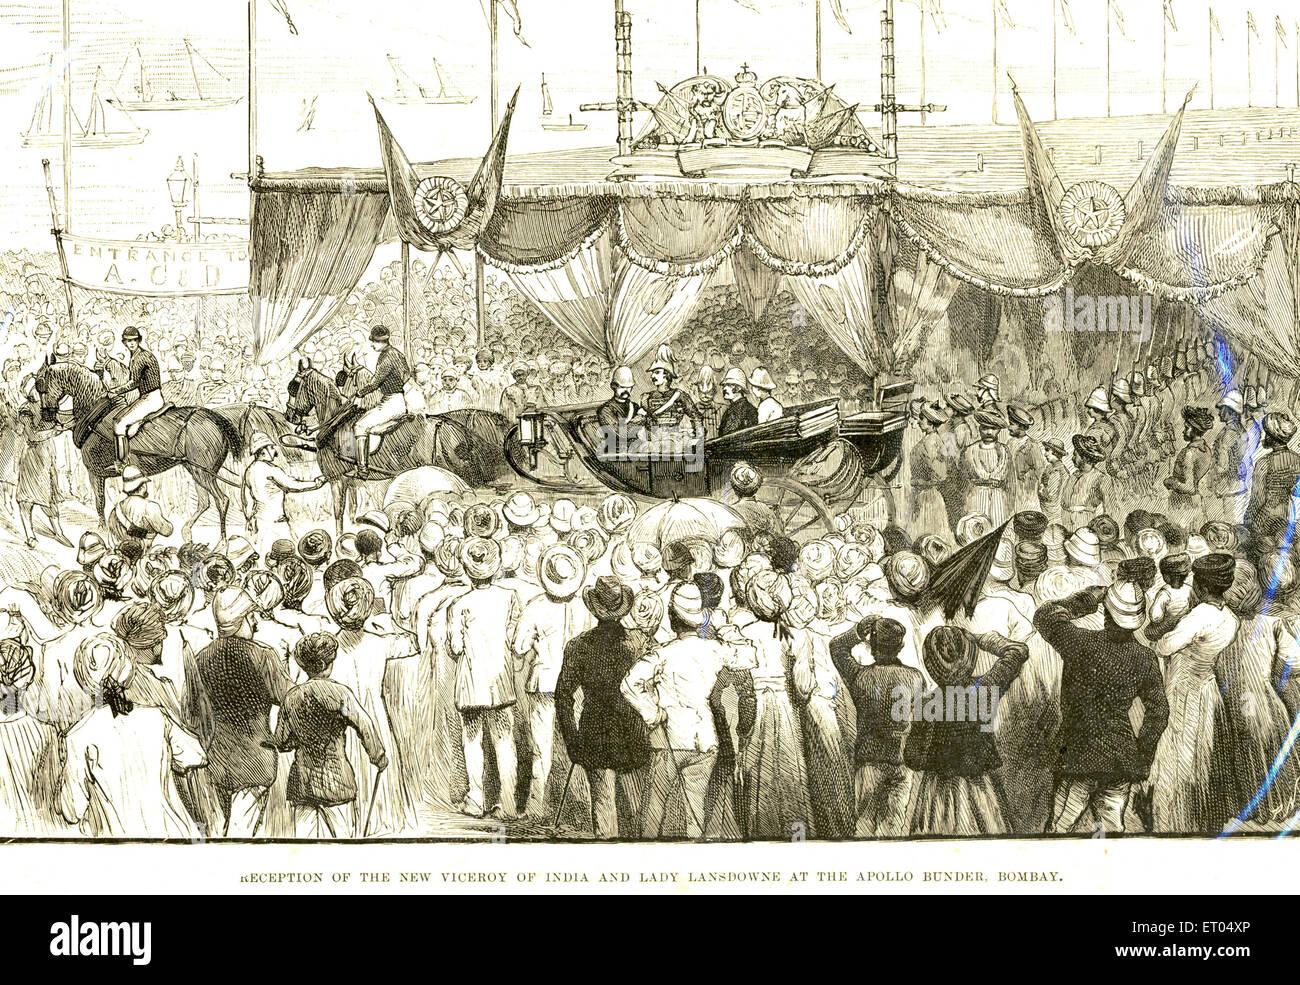 Reception of the new viceroy of India and lady Lansdowne at the Apollo bunder ; Bombay now Mumbai ; Maharashtra - Stock Image